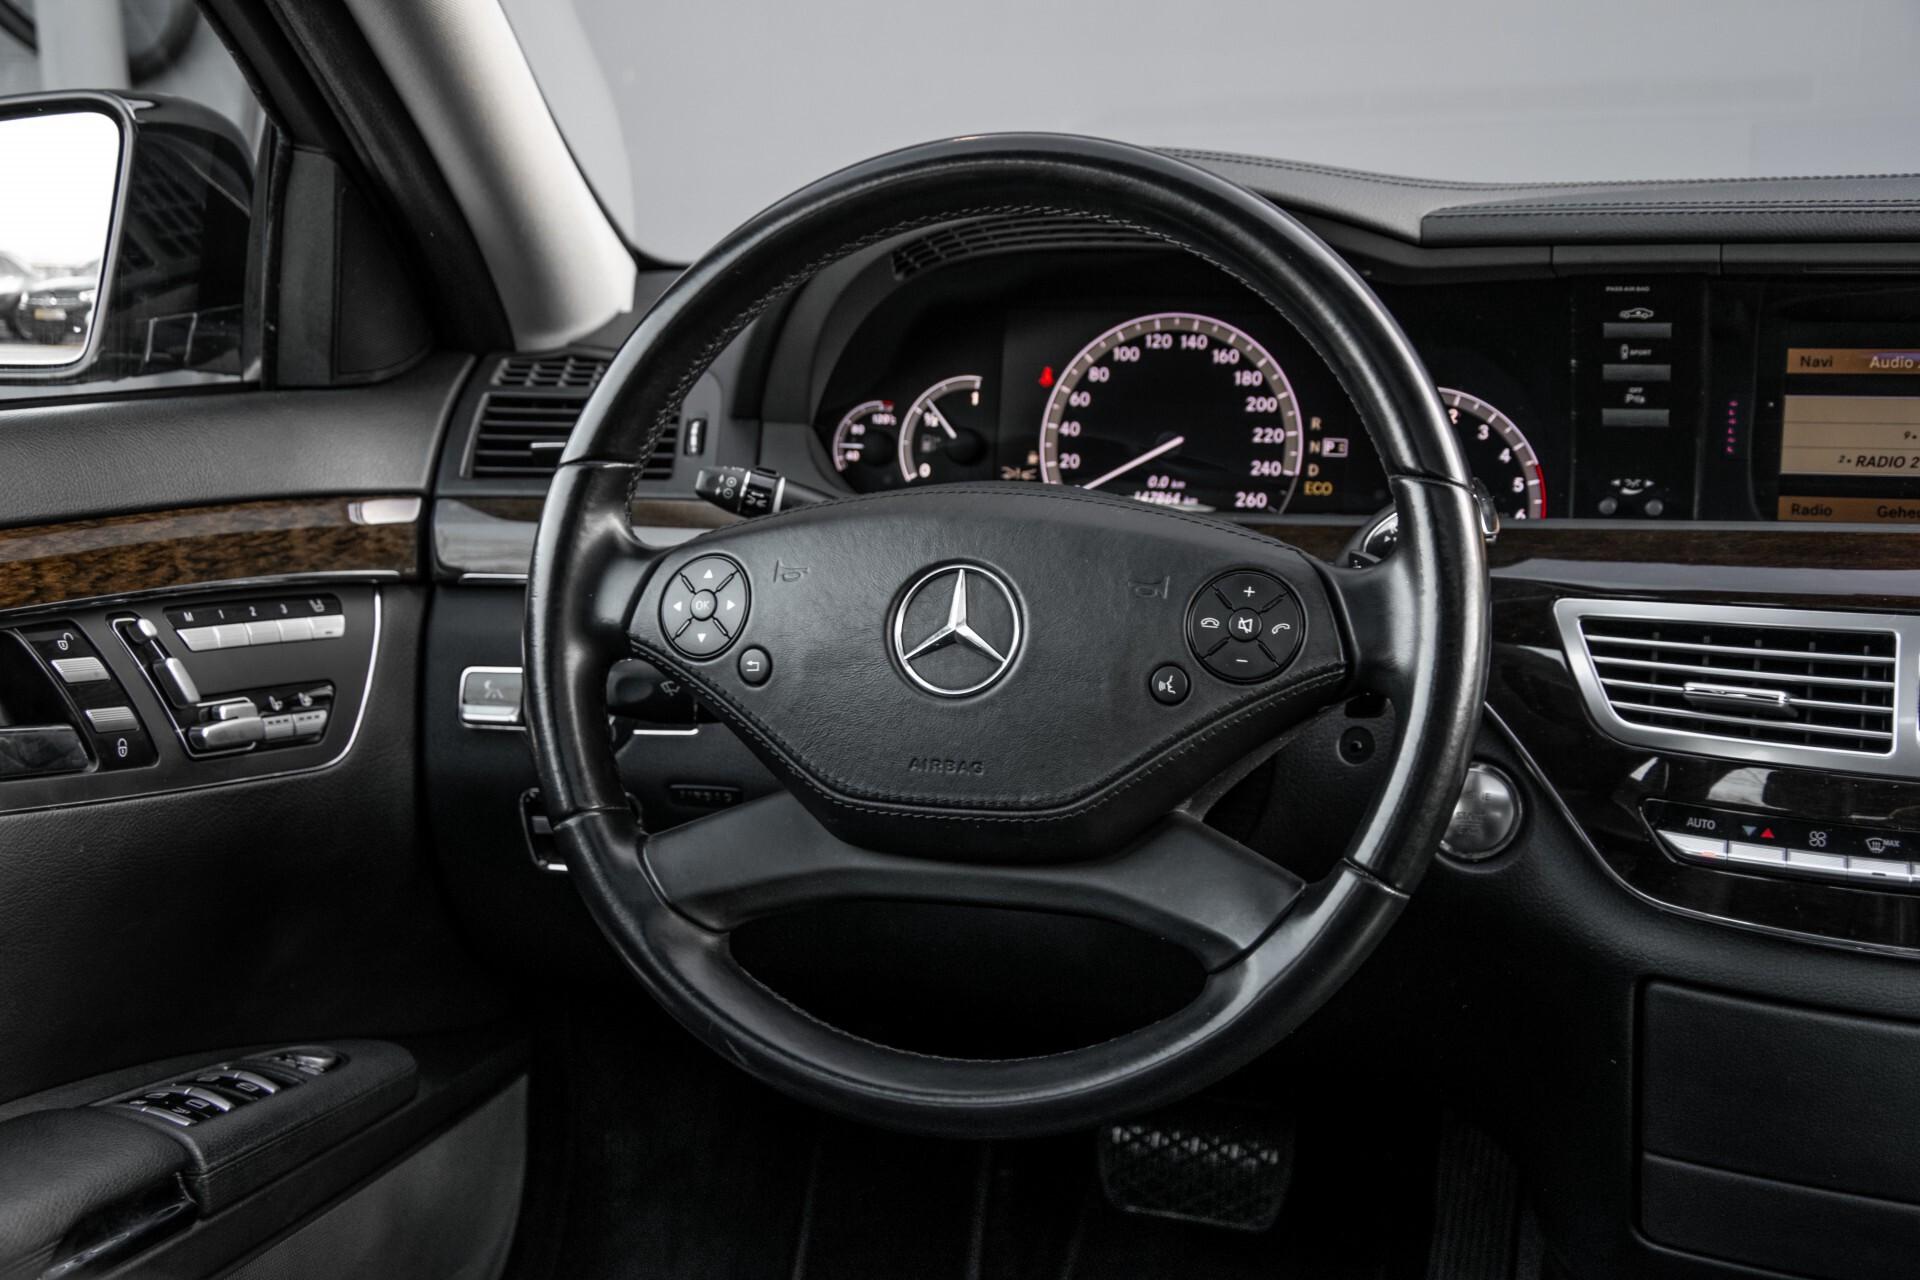 Mercedes-Benz S-Klasse 350 Bluetec Keyless/Distronic/Nightvision/Schuifdak/Harman-Kardon Aut7 Foto 9